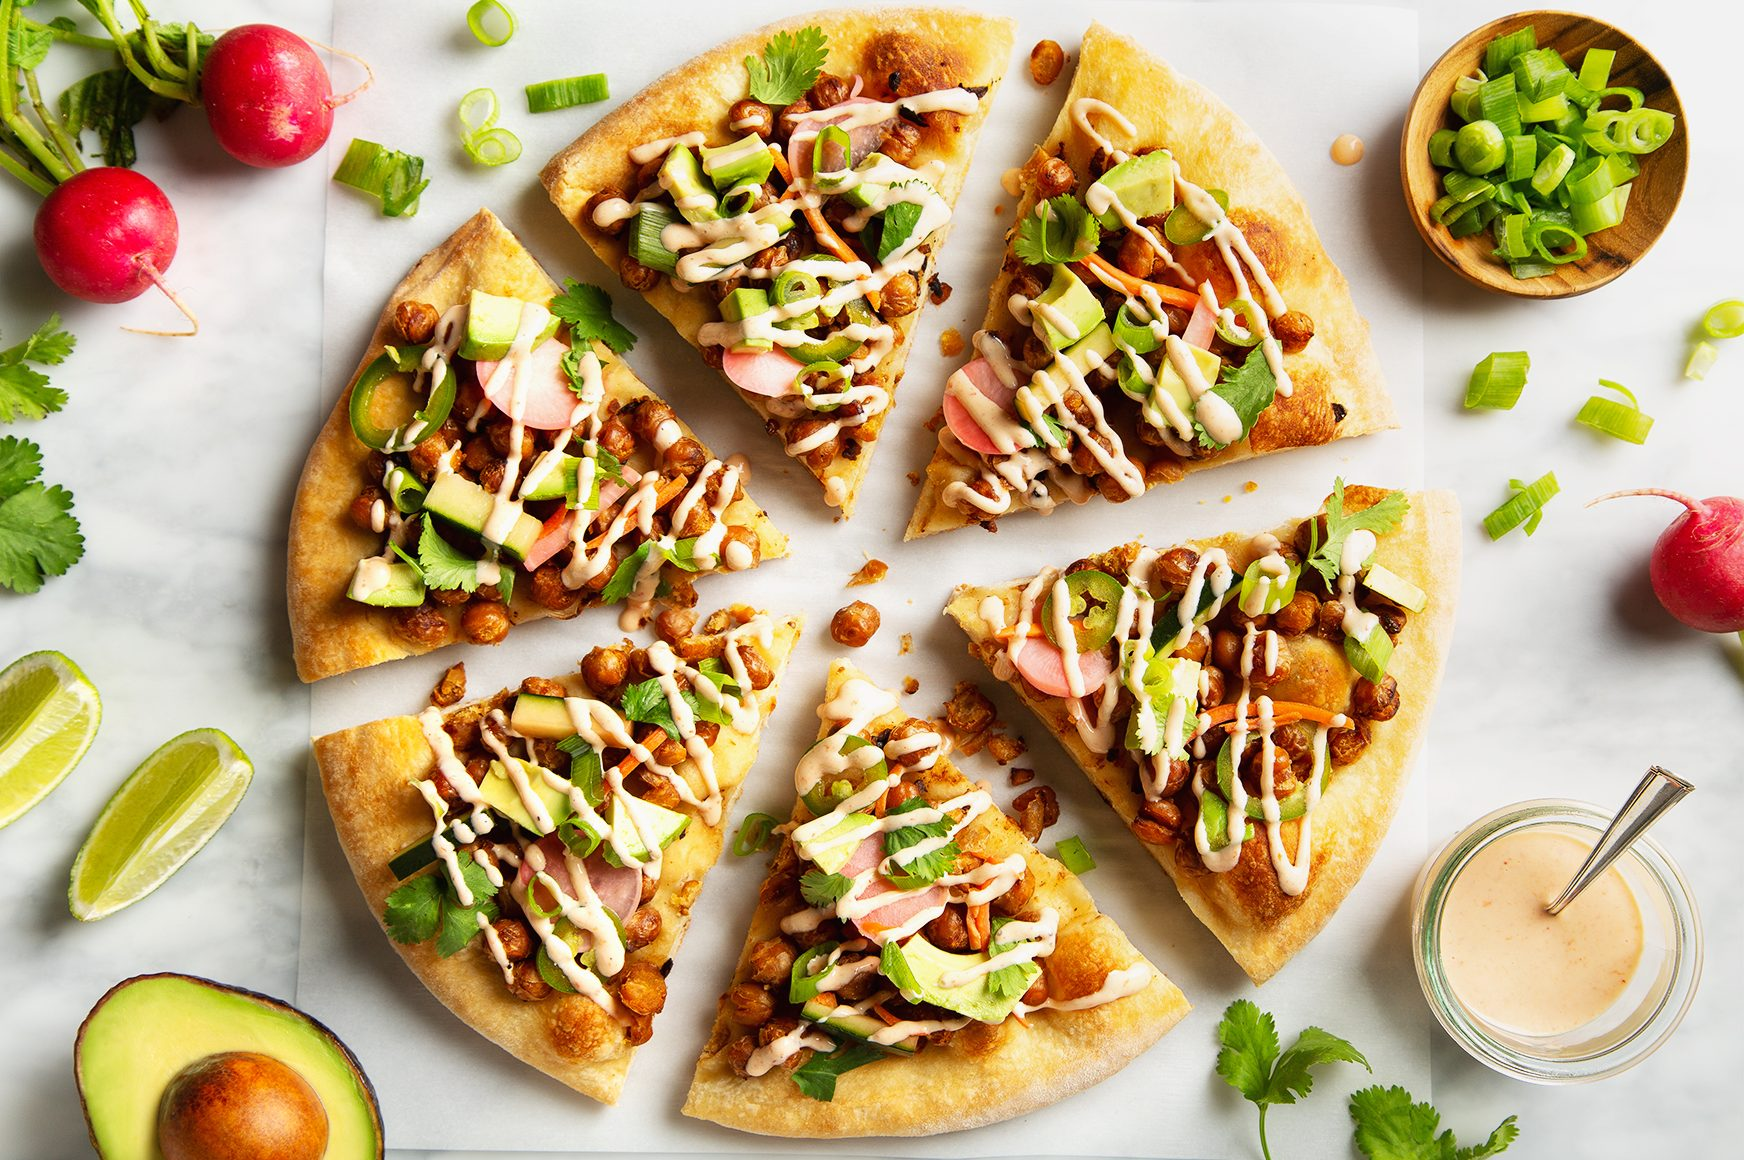 Crispy Chickpea Banh Mi Pizza with Quick Homemade Pickles!   picklesnhoney.com #chickpea #banhmi #pizza #vegan #lunch #dinner #recipe